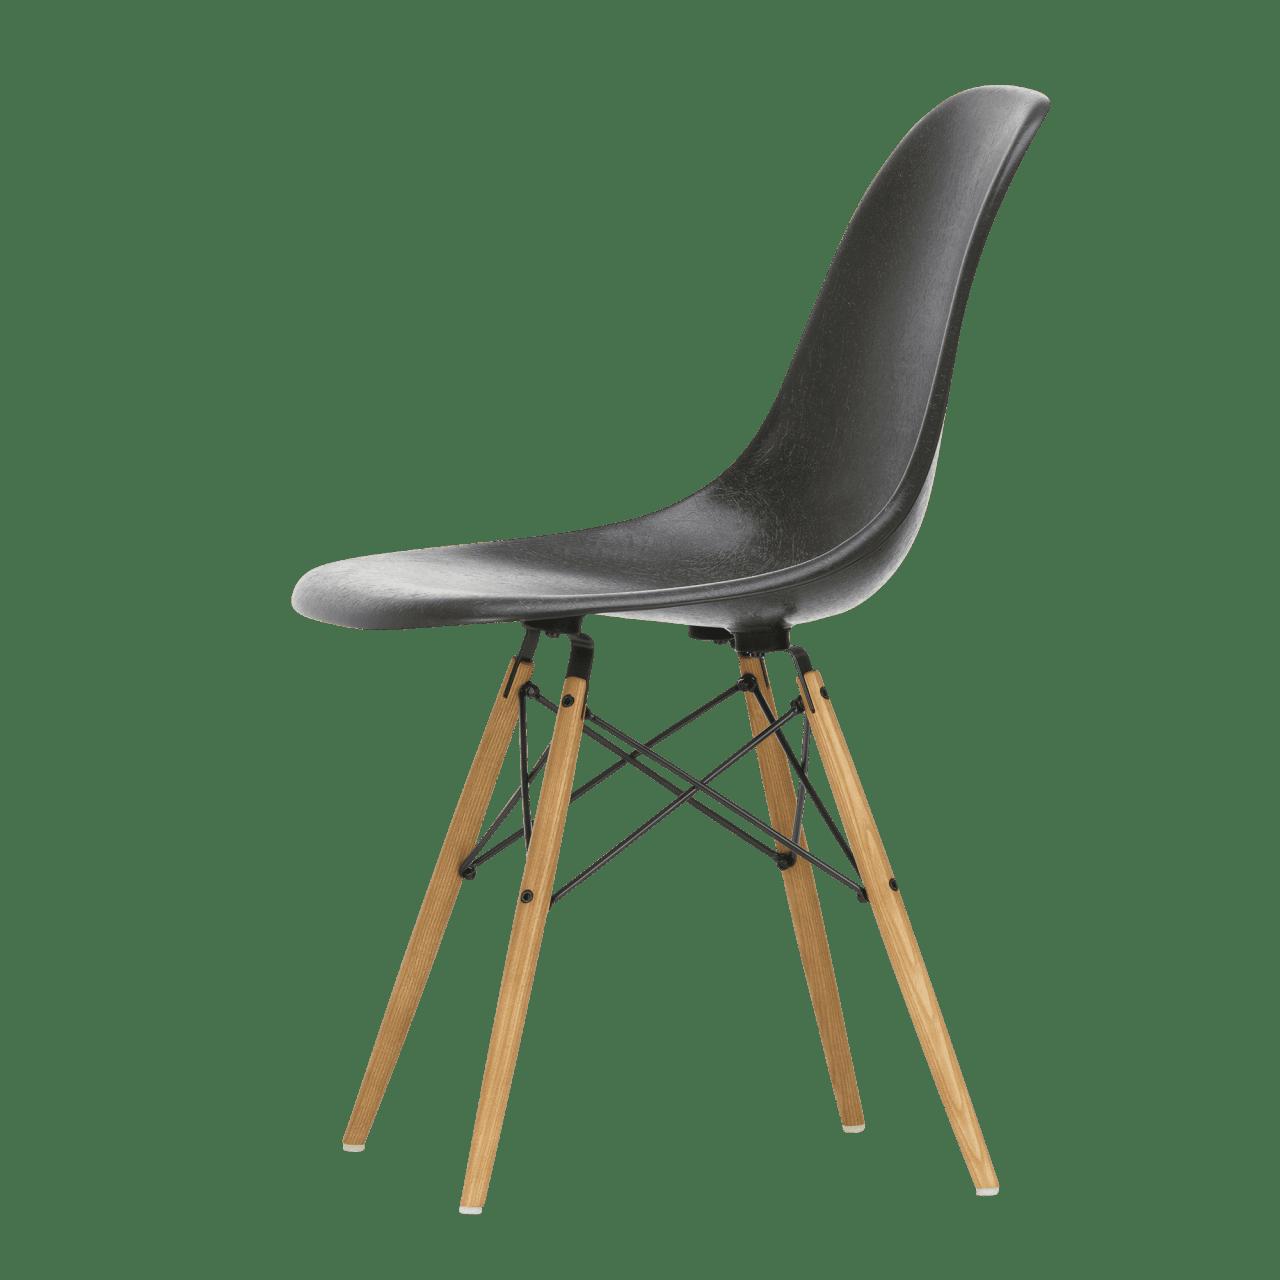 Eames Fiberglass Sidechair DSW